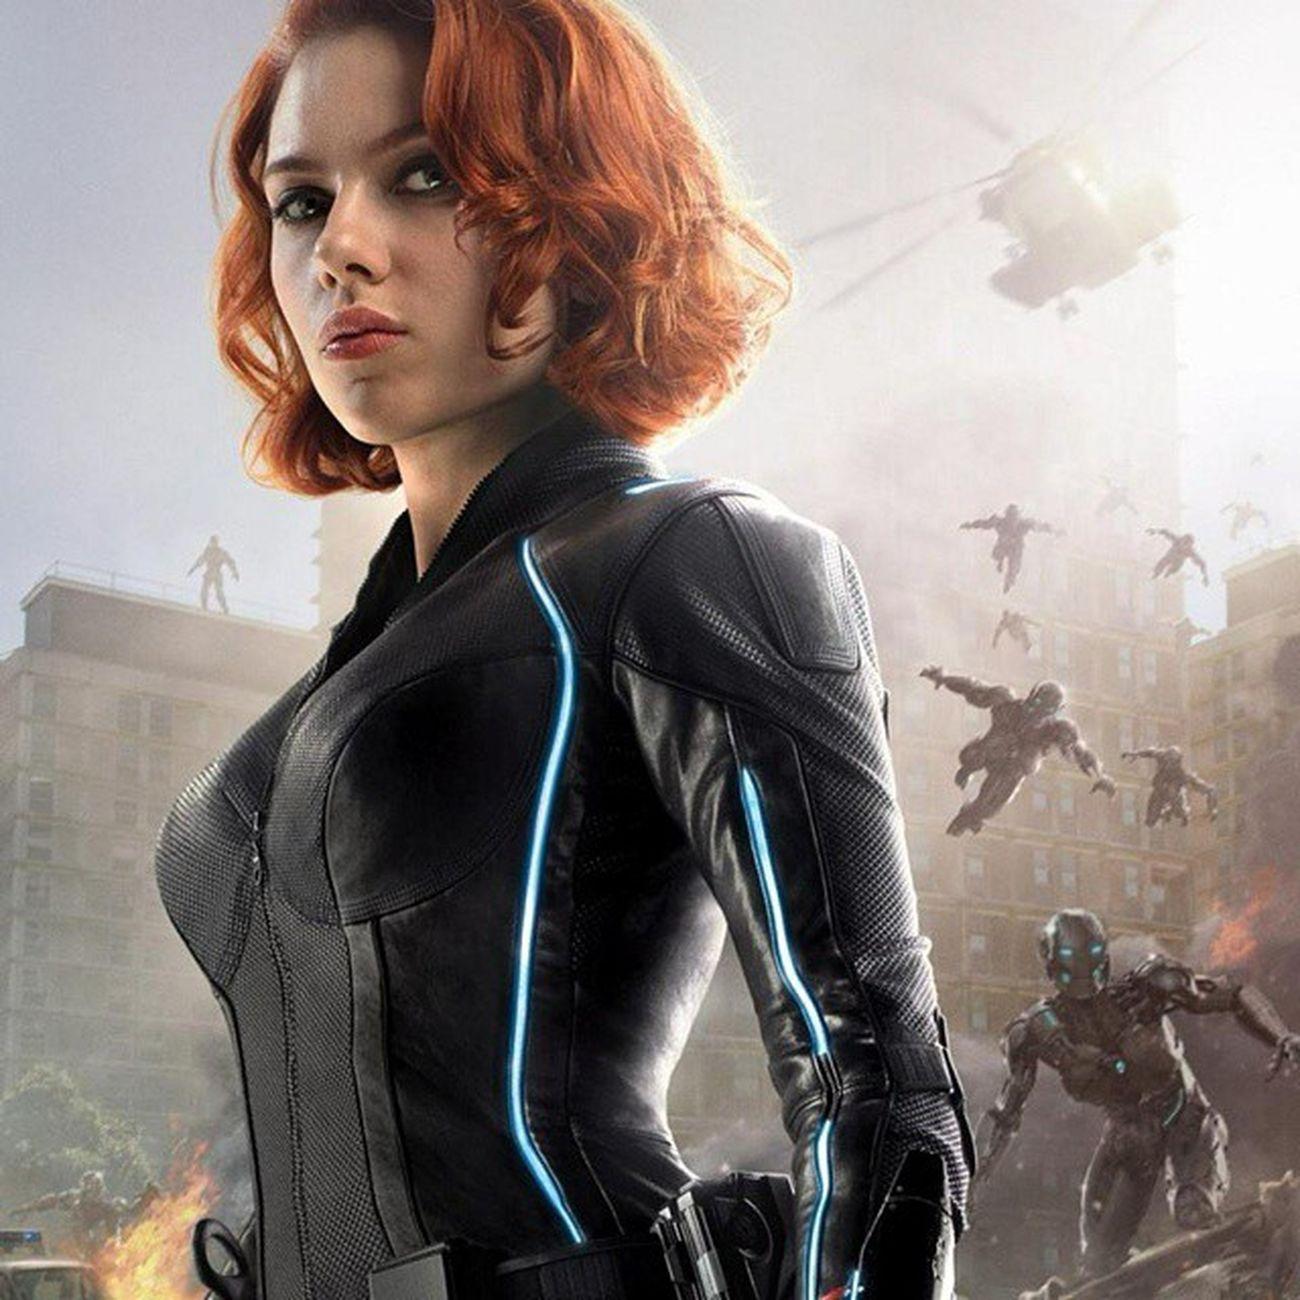 This woman. Only the best... ScarlettJohansson Avengers Avengersageofultron